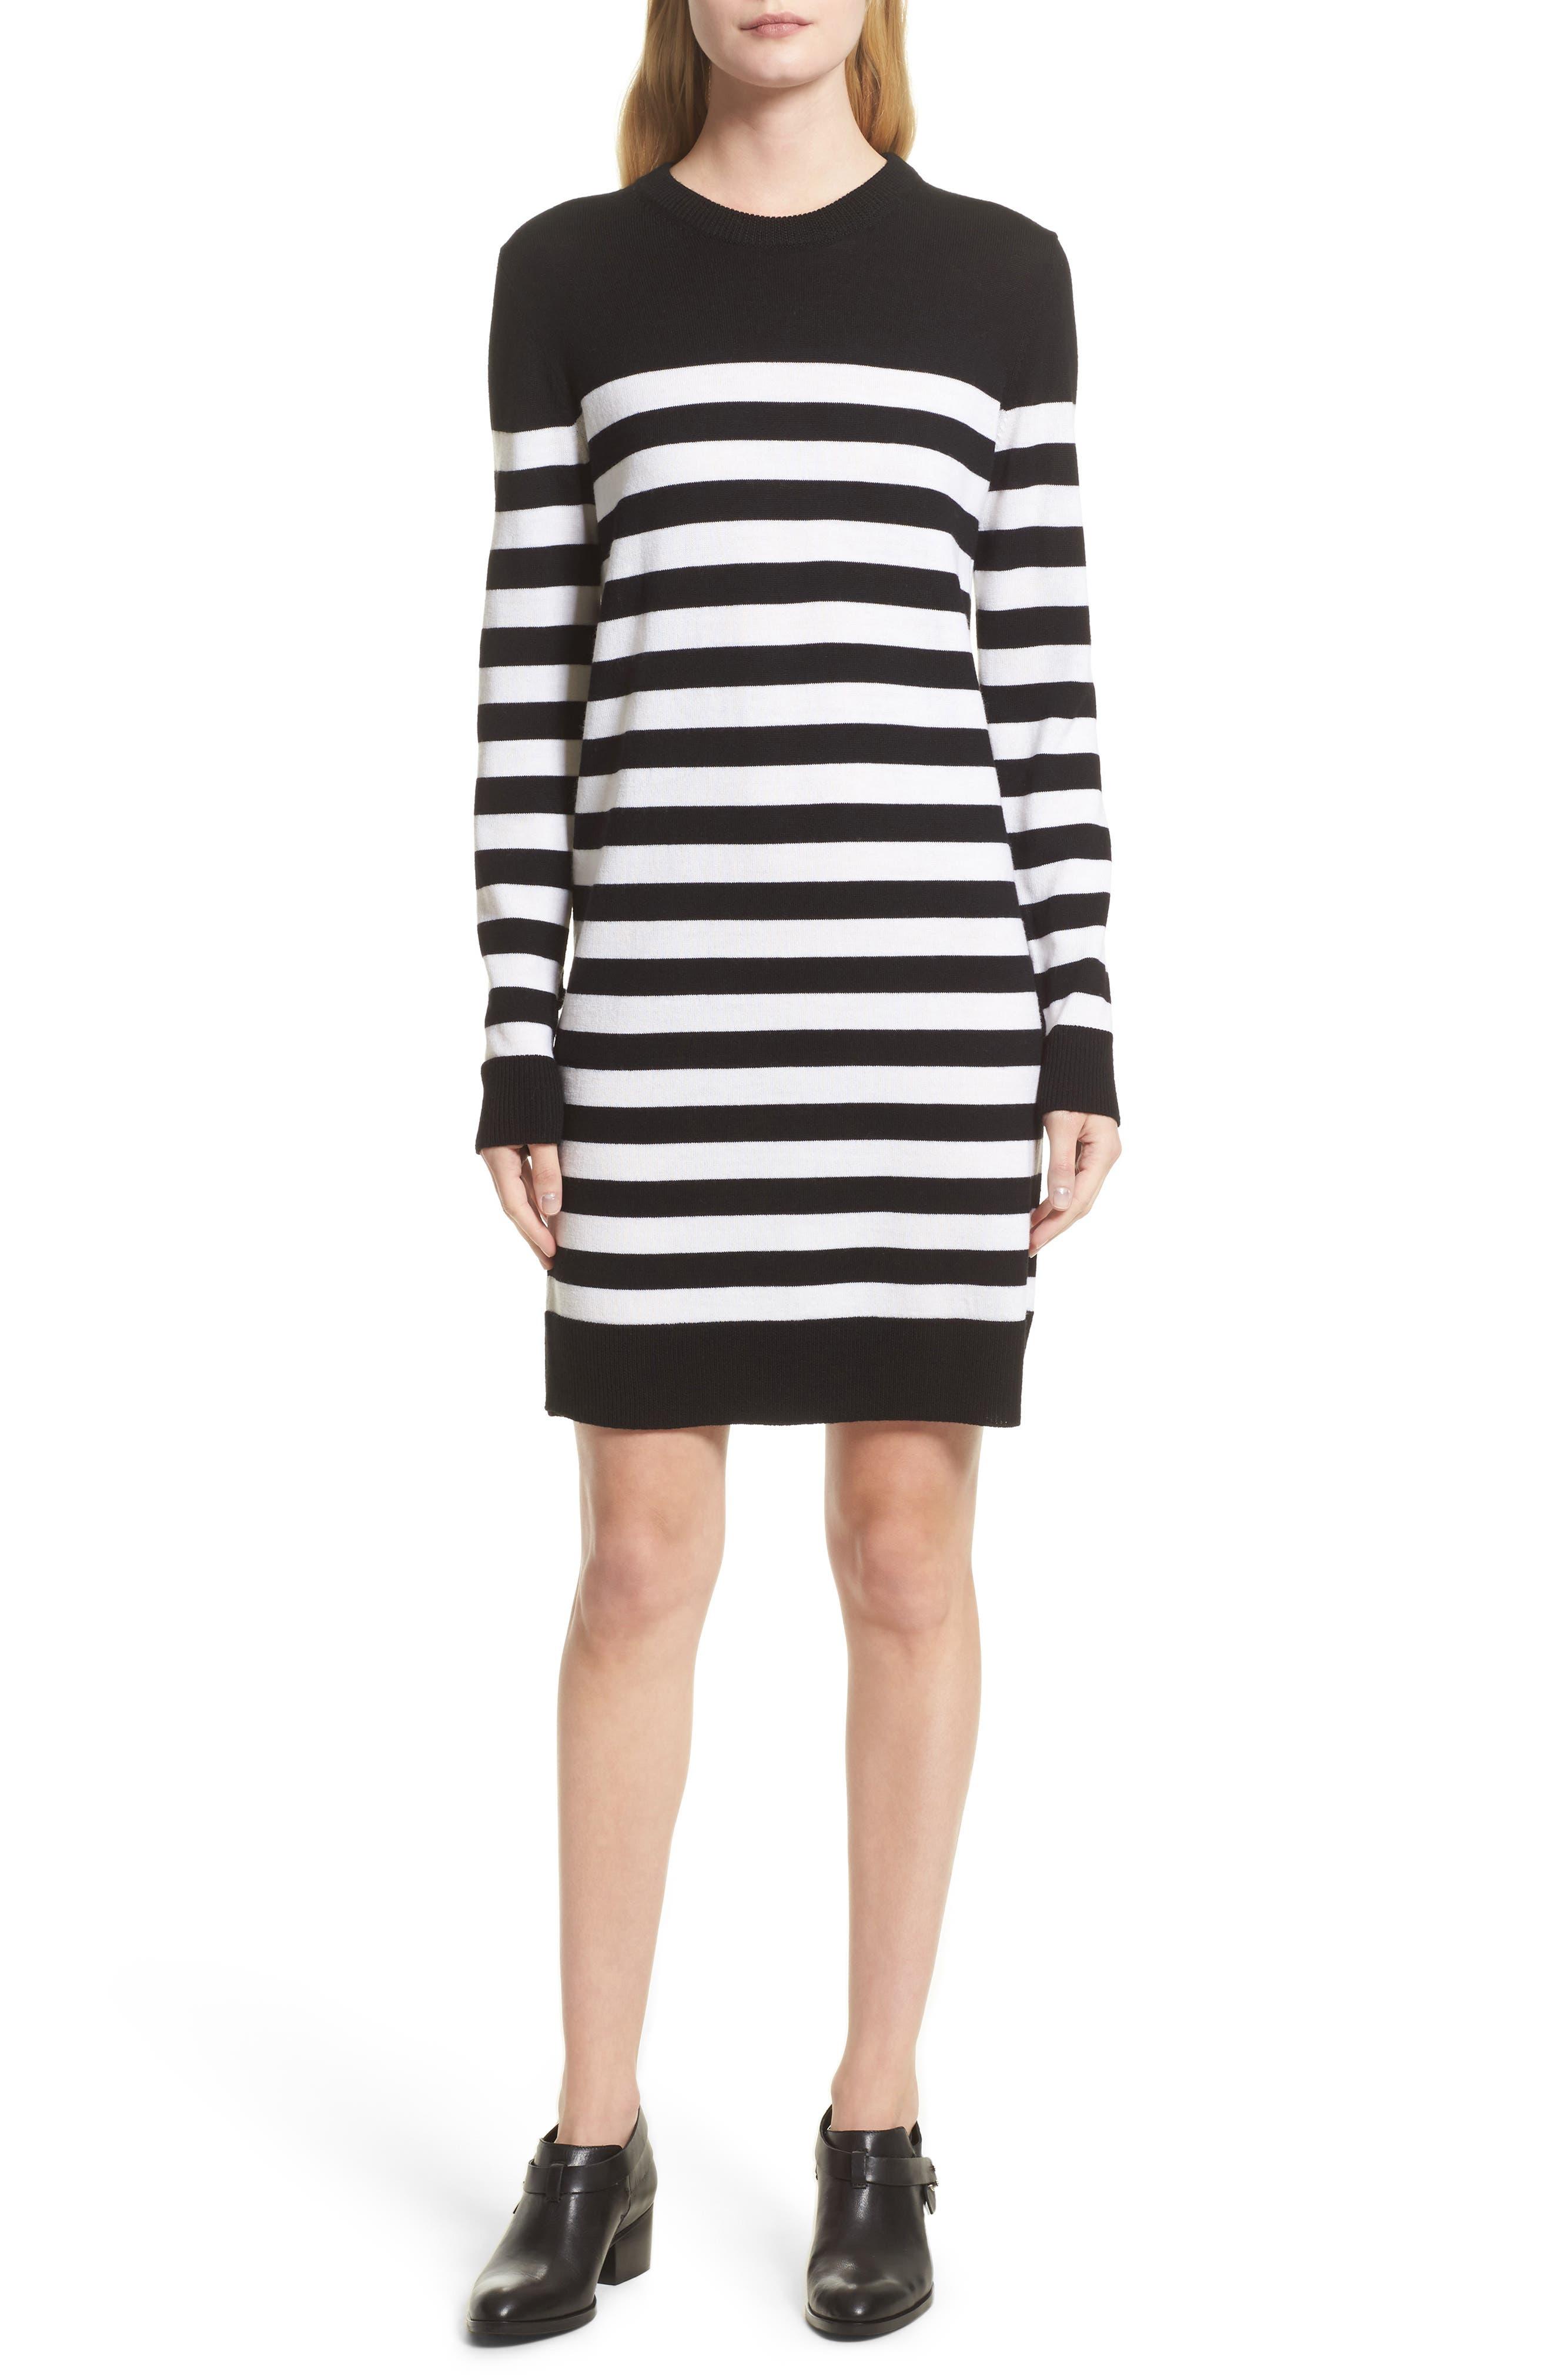 Main Image - rag & bone Lilian Stripe Merino Wool Dress (Nordstrom Exclusive)